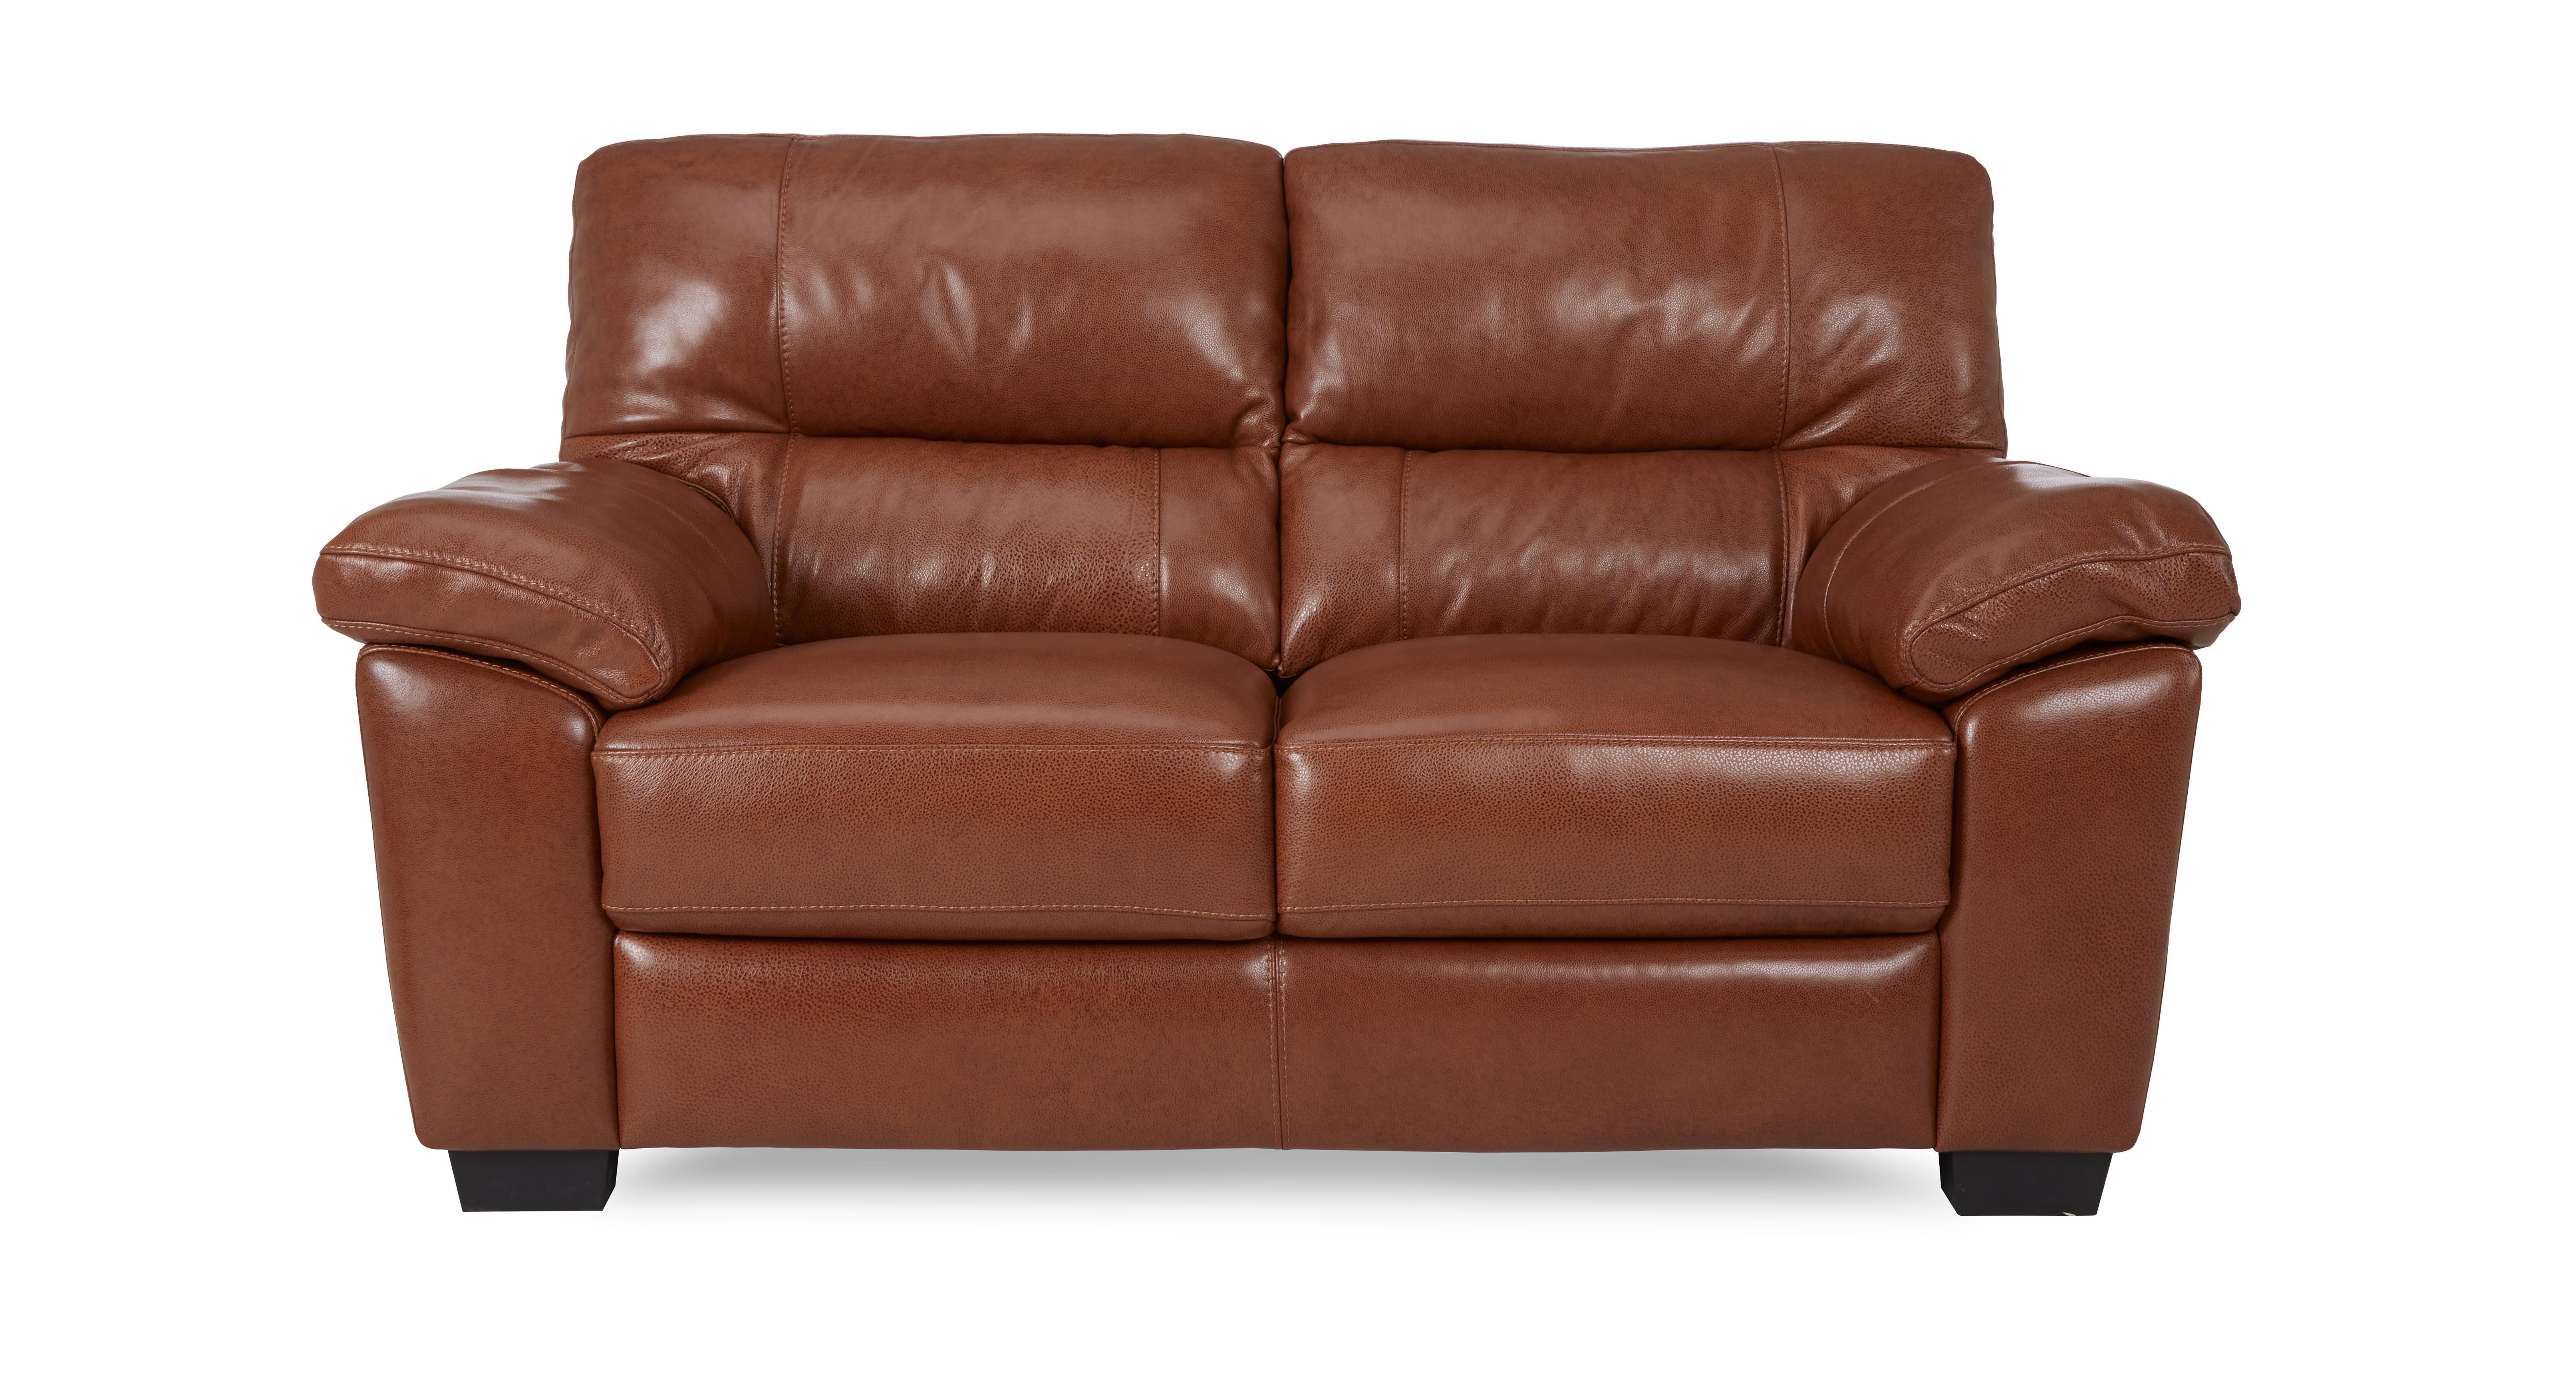 Brandy Leather Sofa hmmi